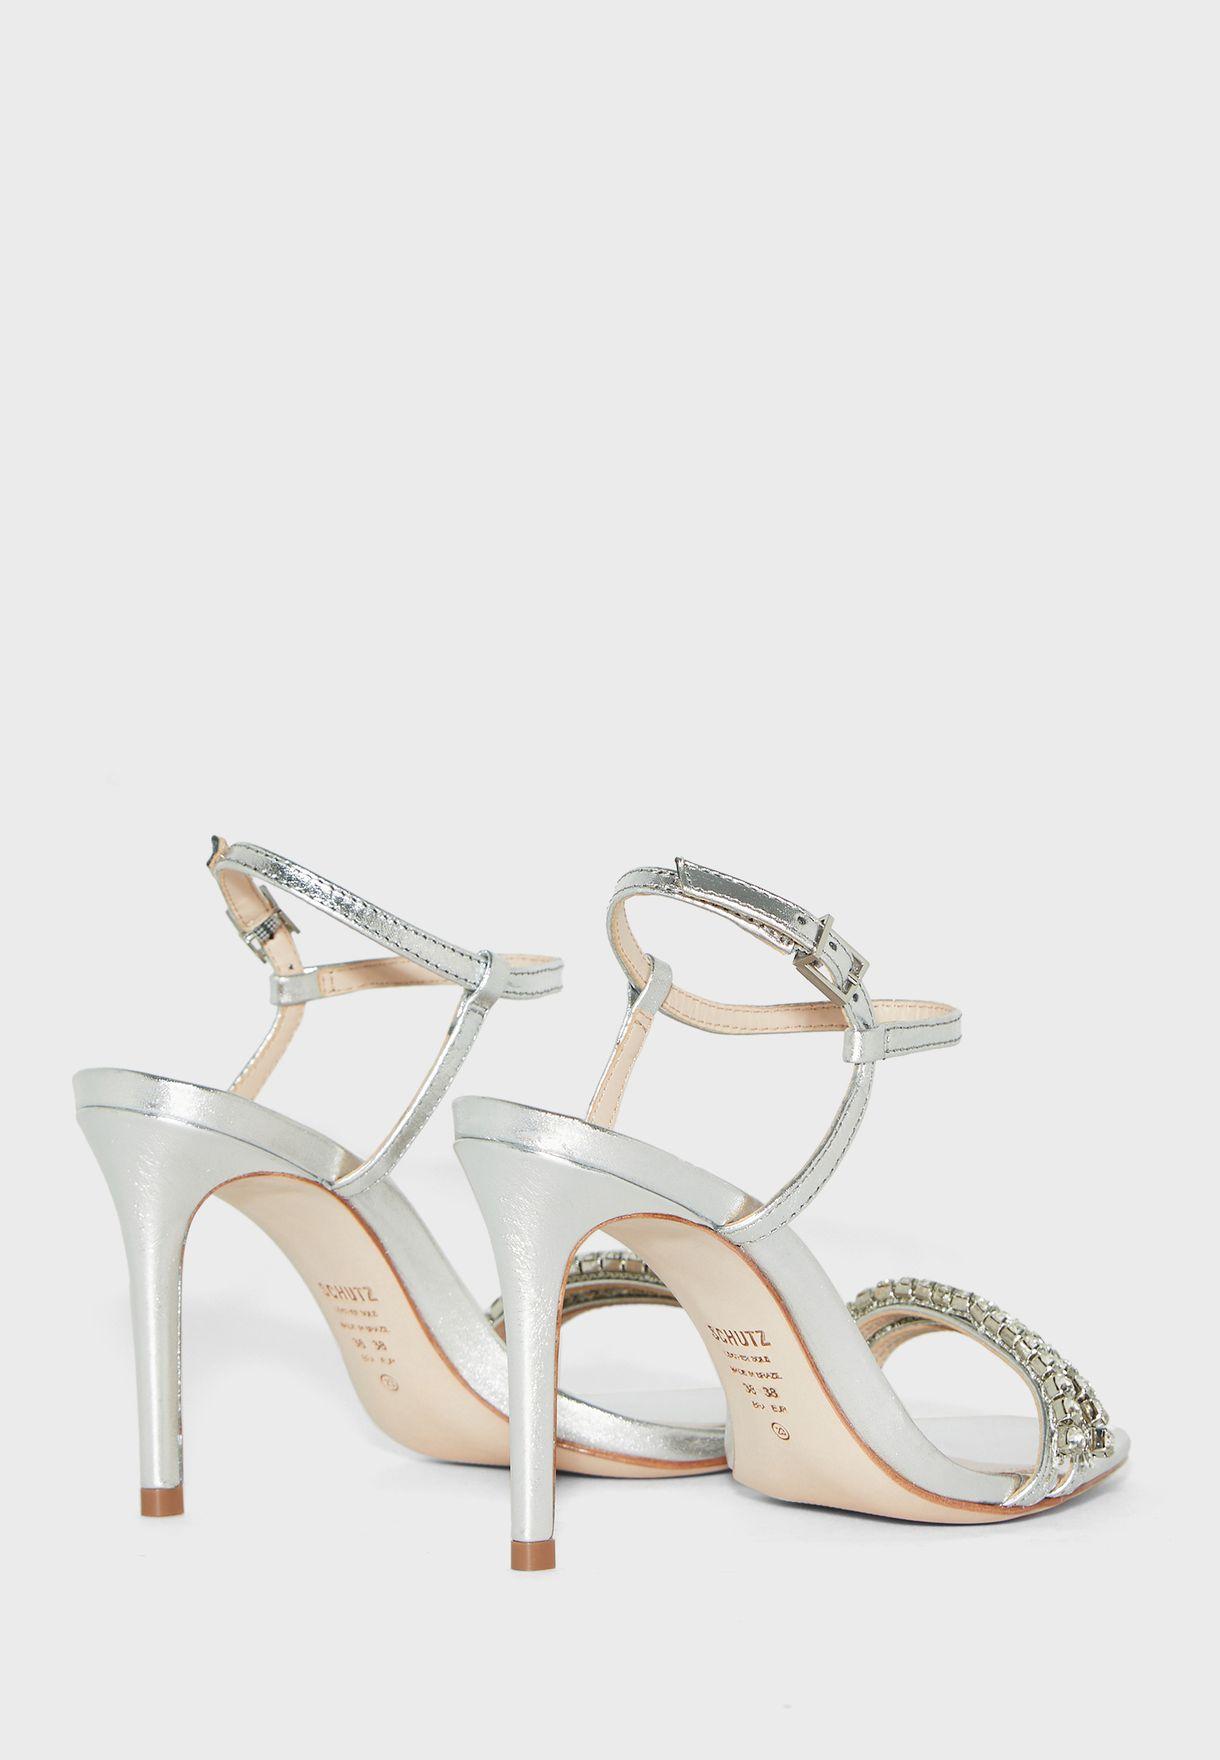 Stud Detail Ankle Strap Sandal - Silver